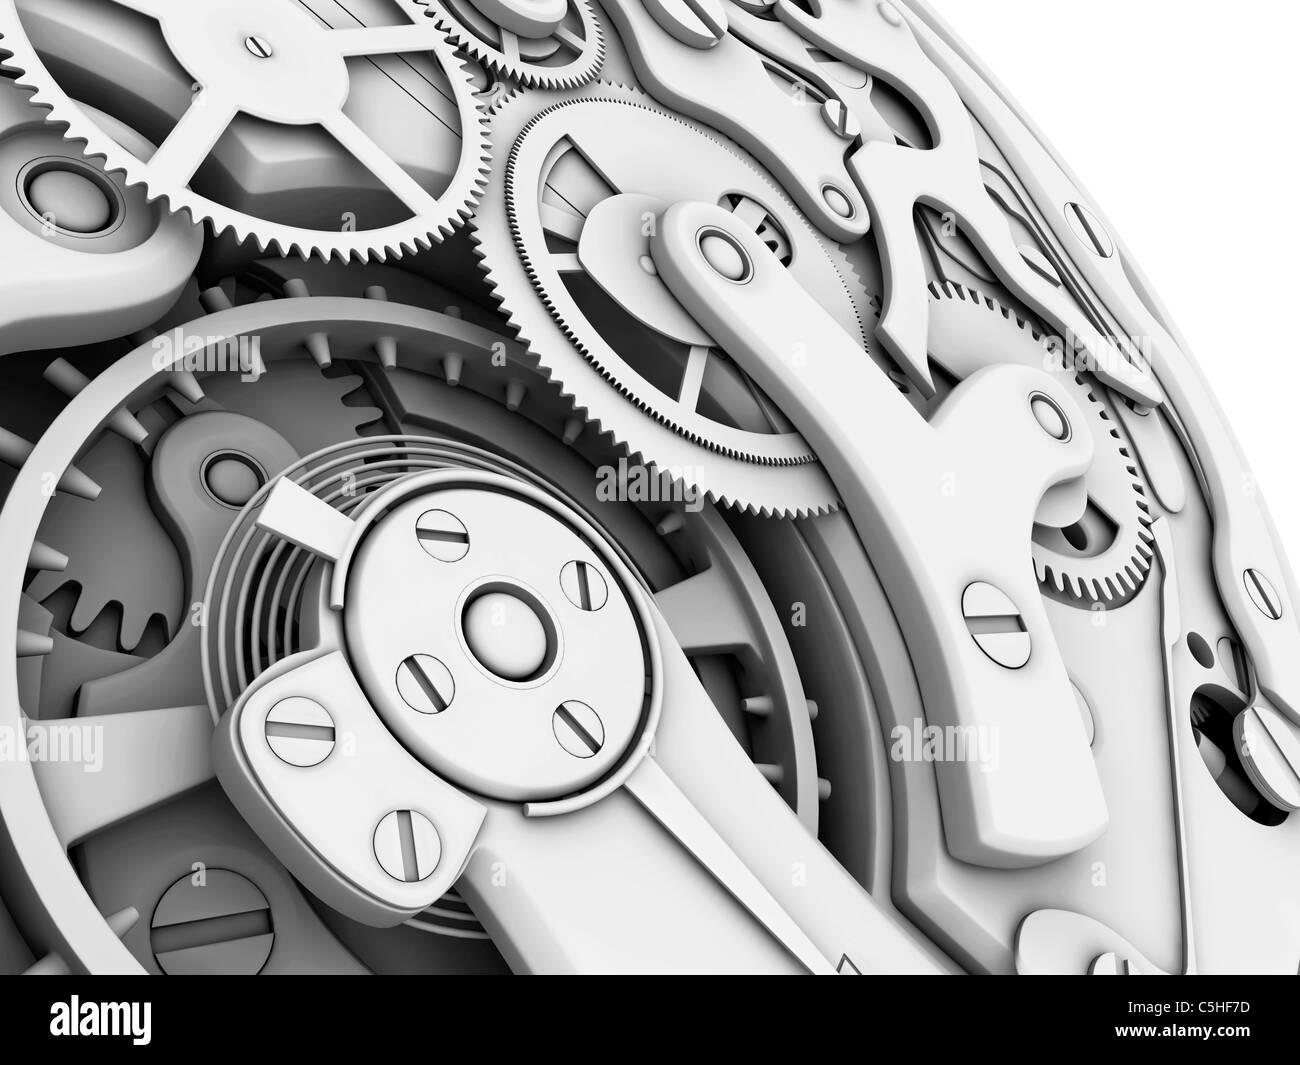 Wrist watch interior - Stock Image